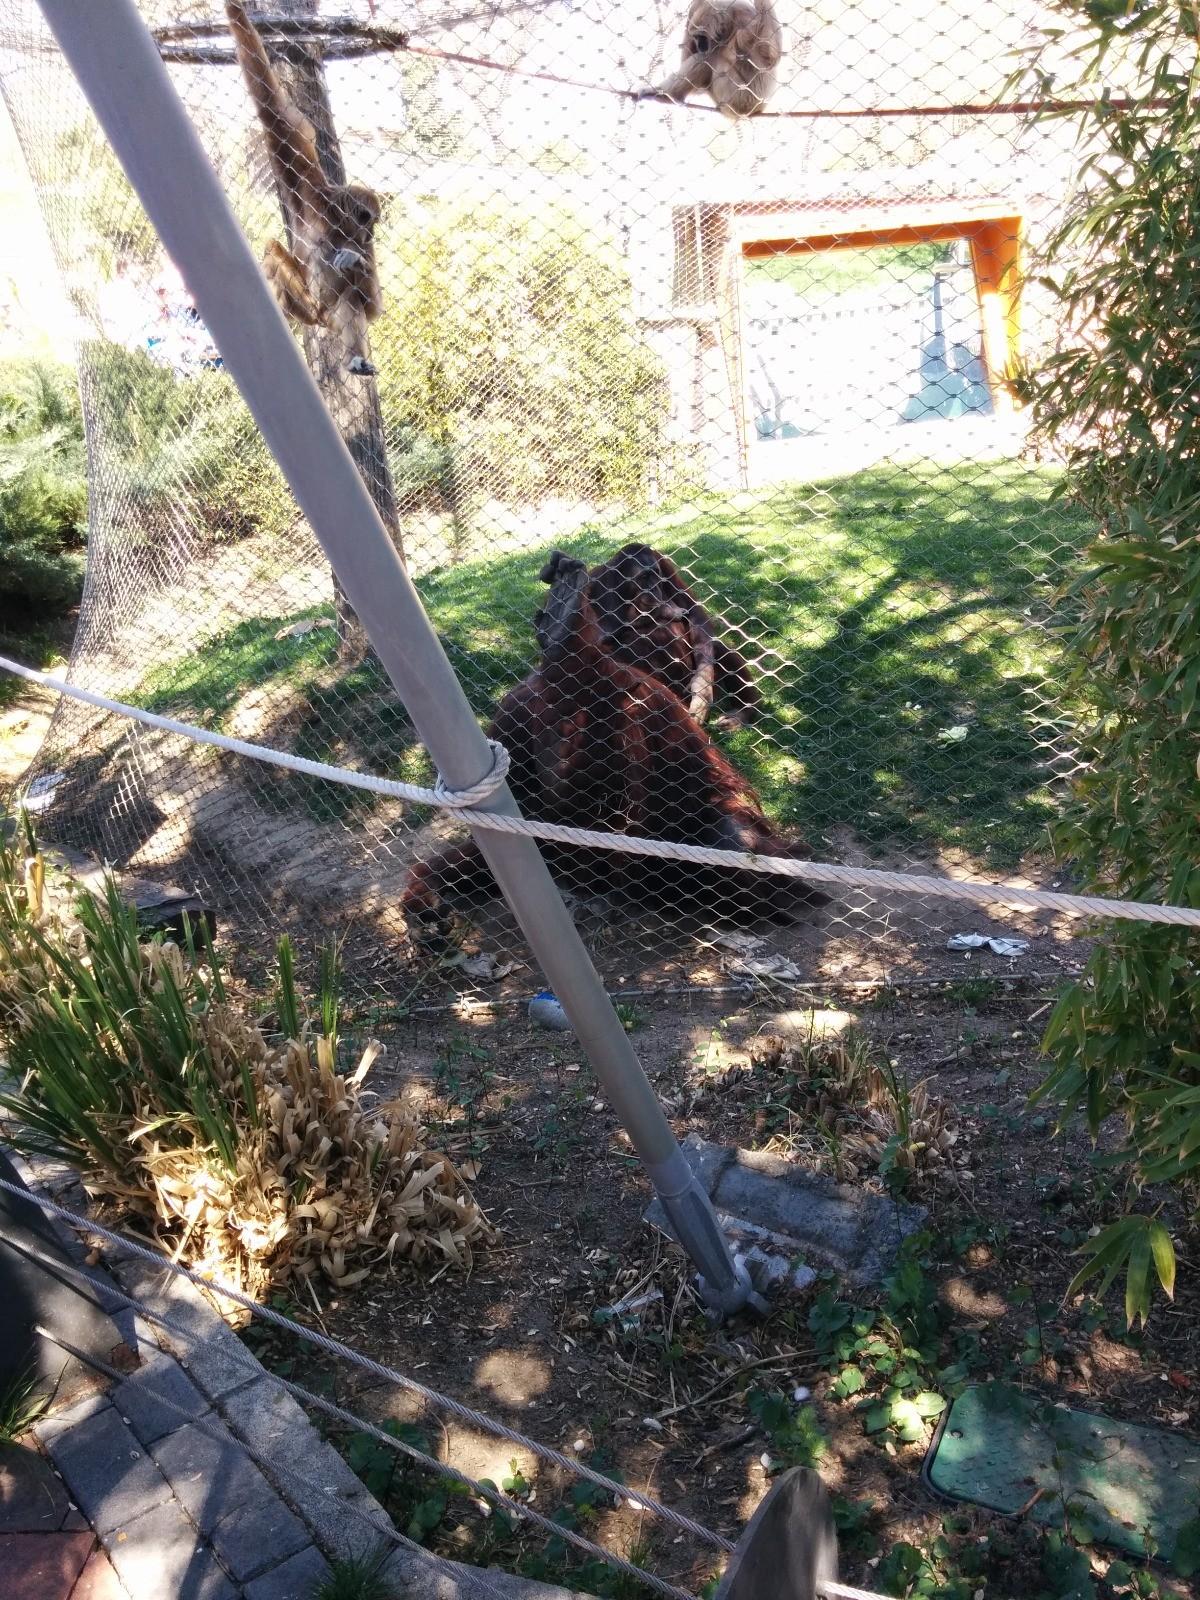 el-zoo-madrid-4c87fd2cfead569878a175cee0